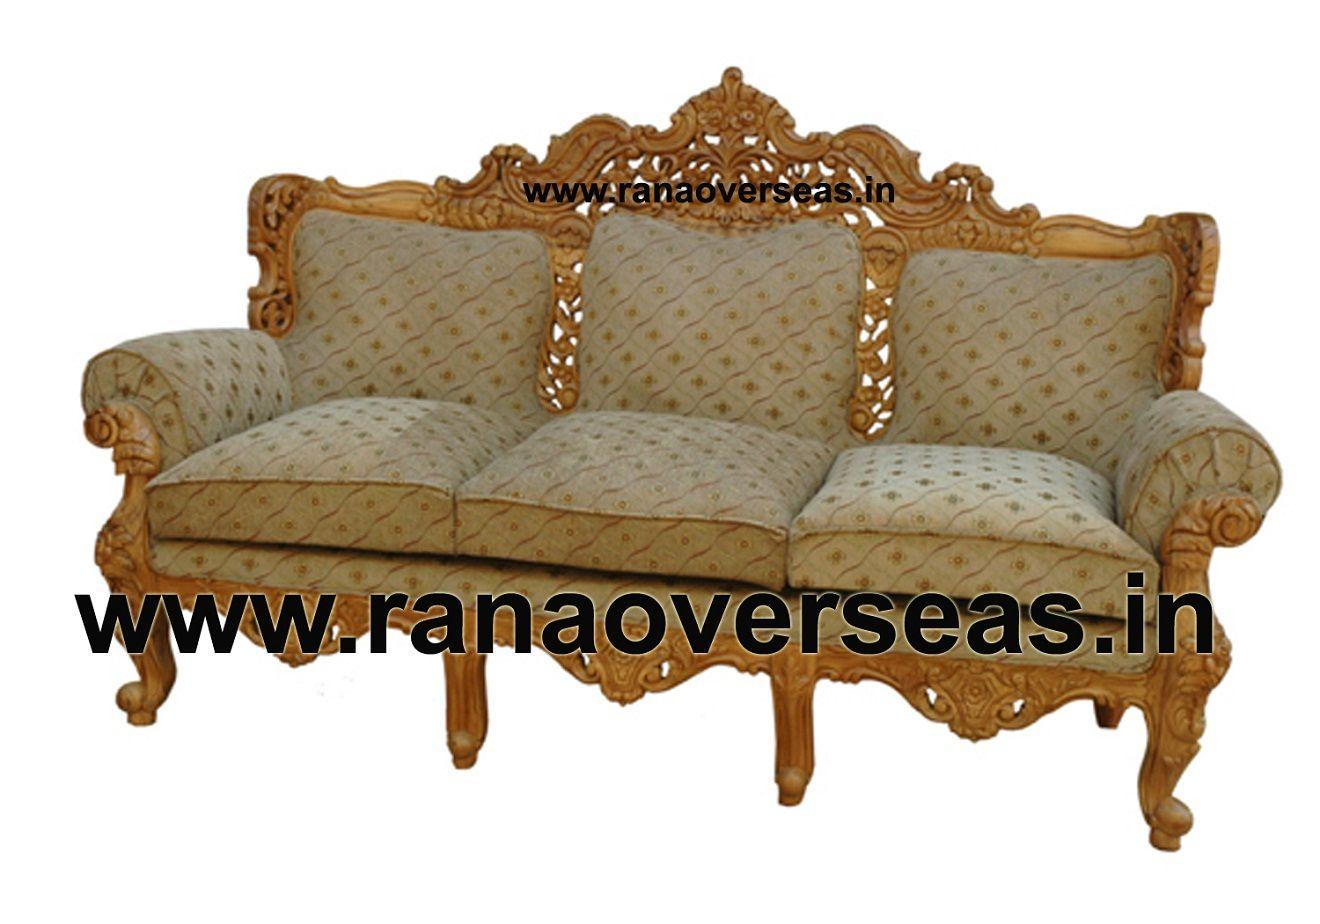 sofa sets for living room in malaysia | Sofa set, Nice furniture ...